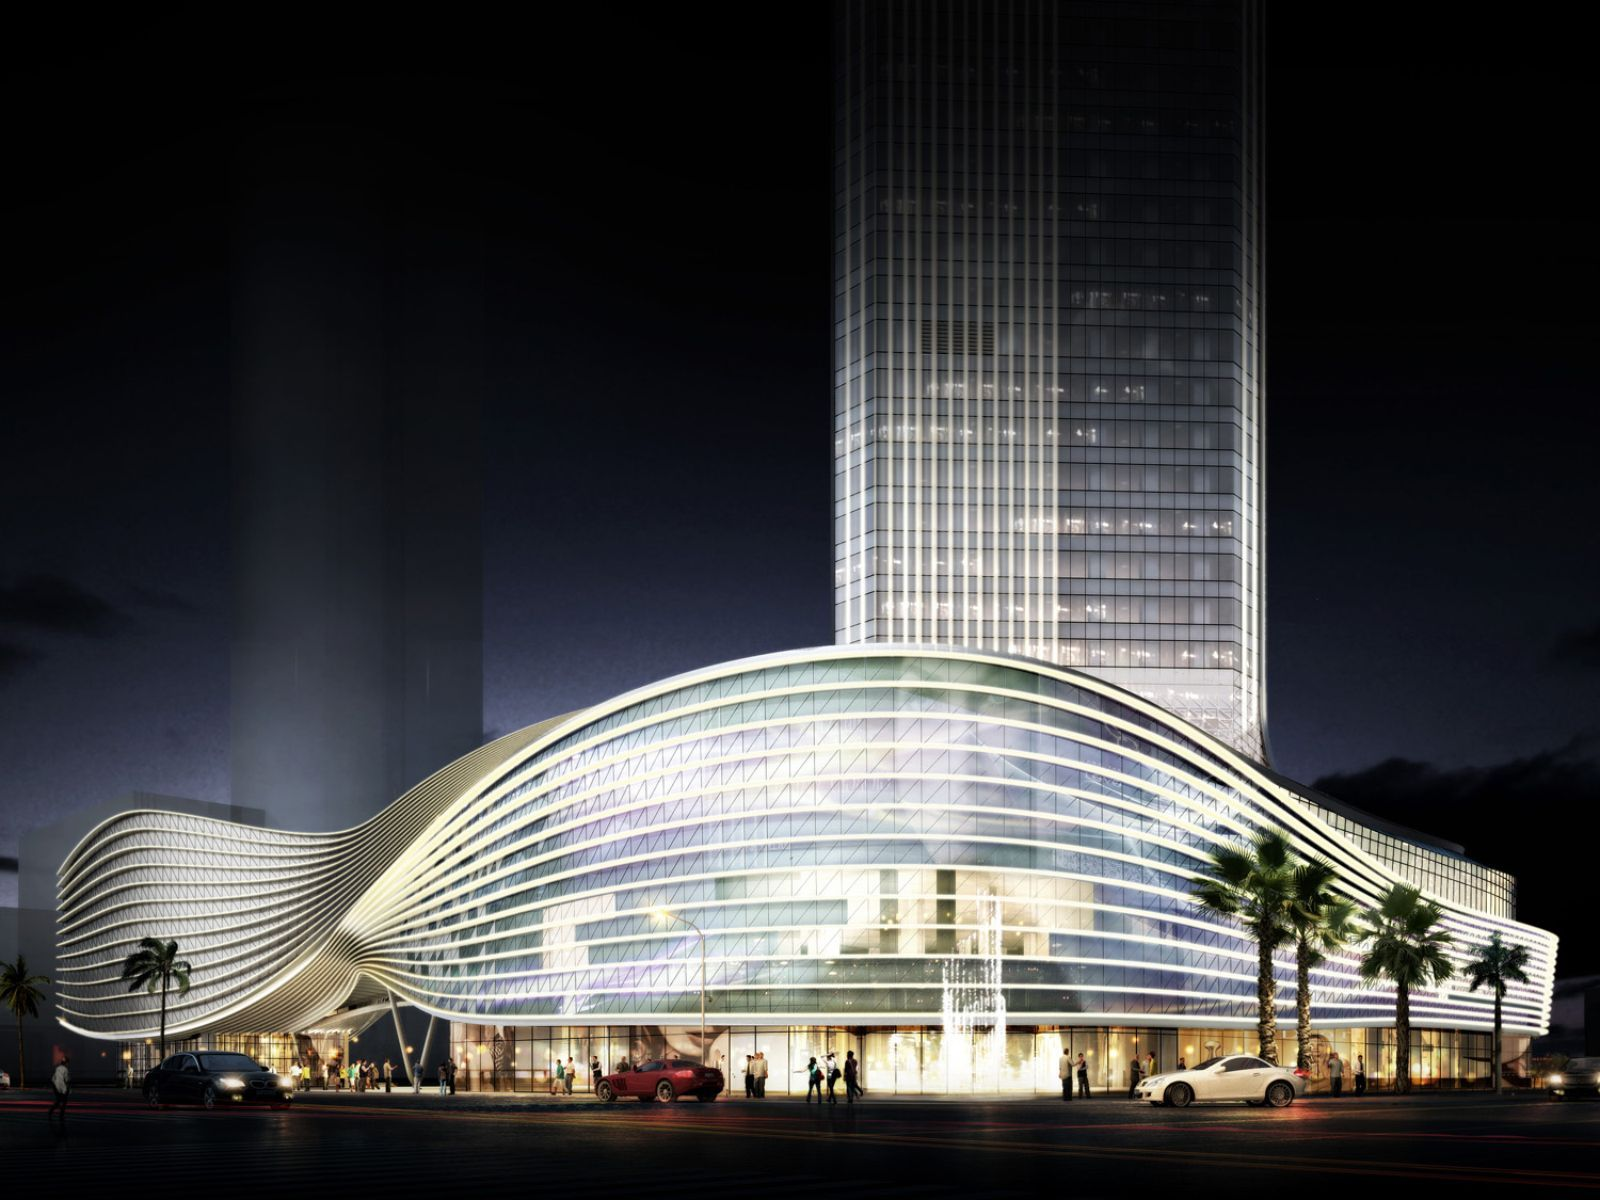 Hengqin-International-Financial-Center-by-Aedas-07.jpg (1600×1200 ...